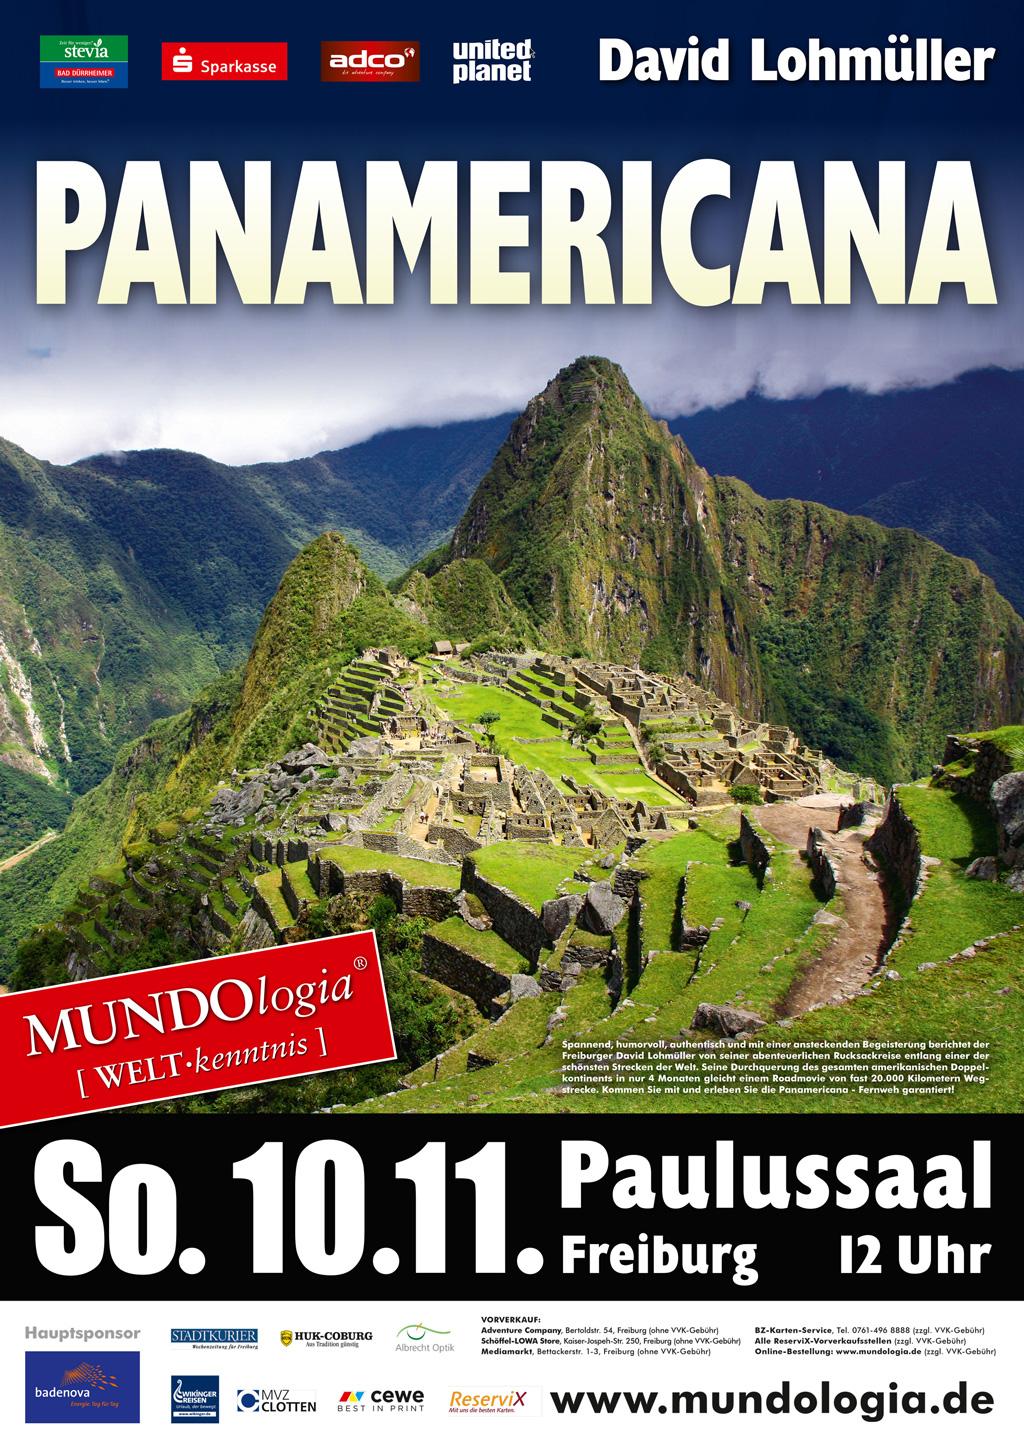 Panamericana Mundologia